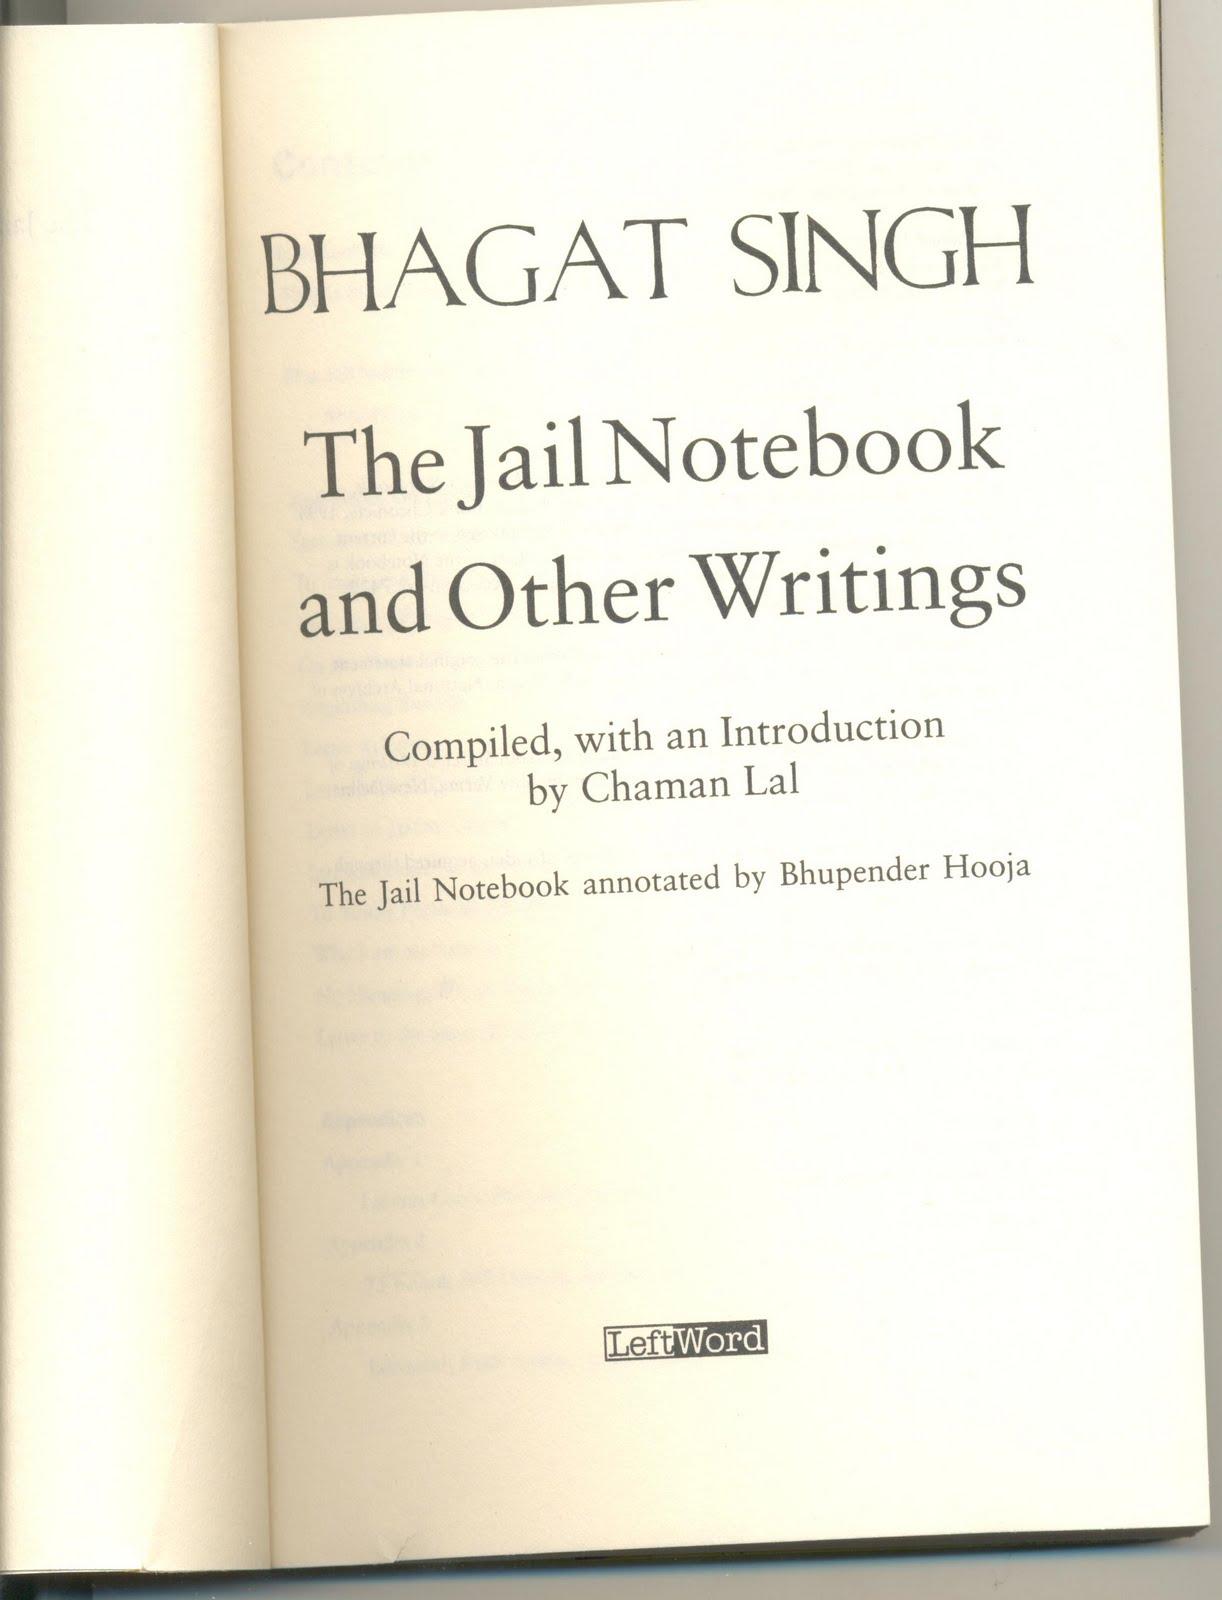 bhagat singh study chaman lal the jail notebook and other the jail notebook and other writings of bhagat singh